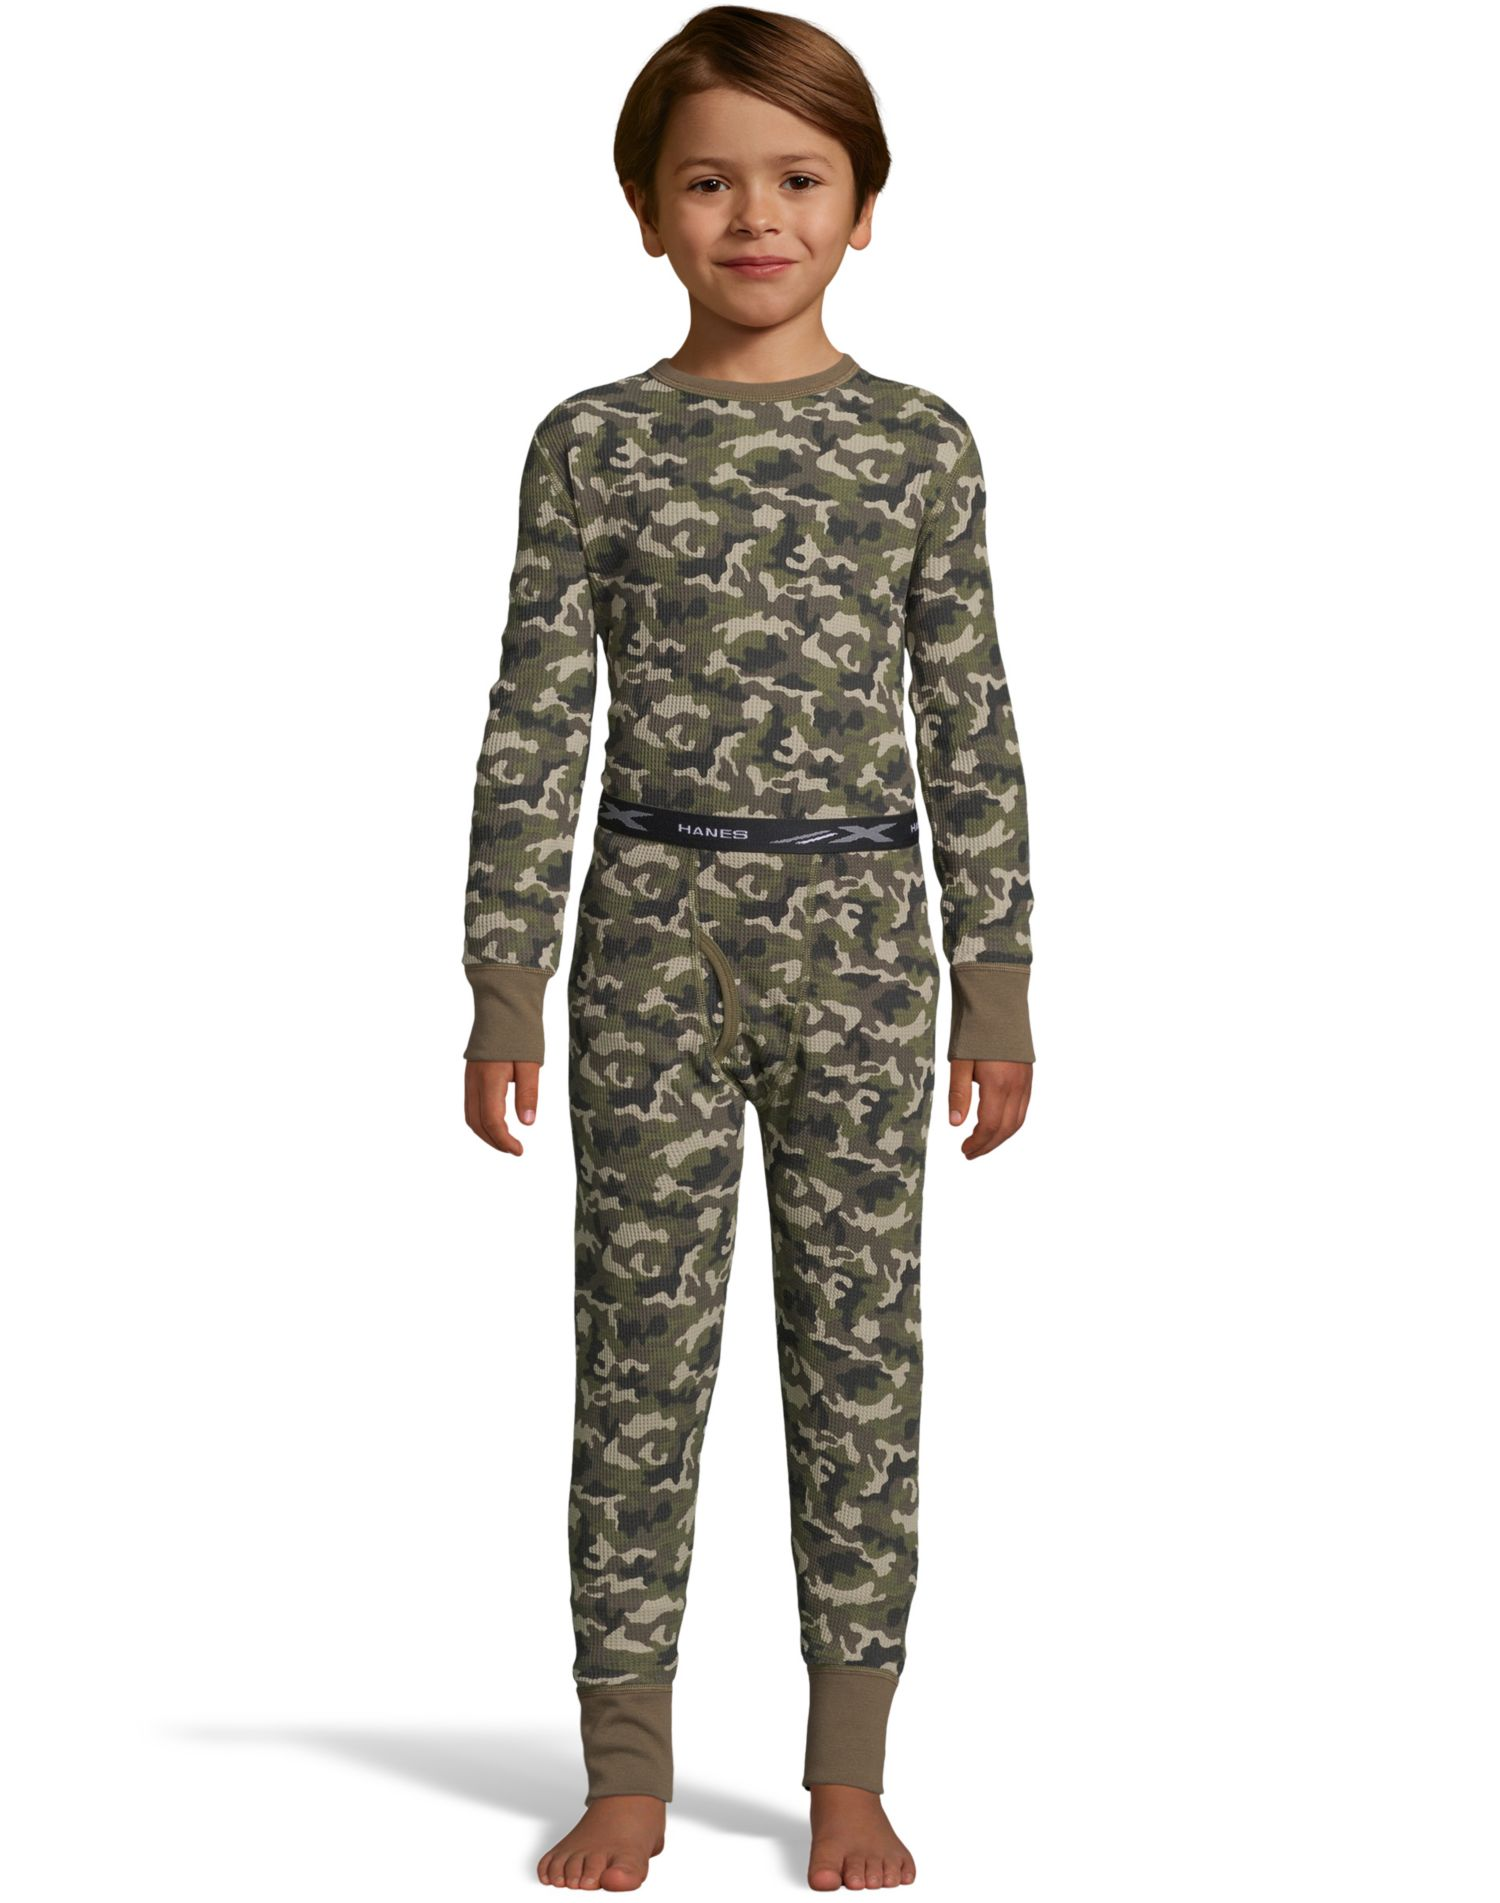 Hanes Boys Waffle Knit Thermal Camo Set, M, Camo Green Print